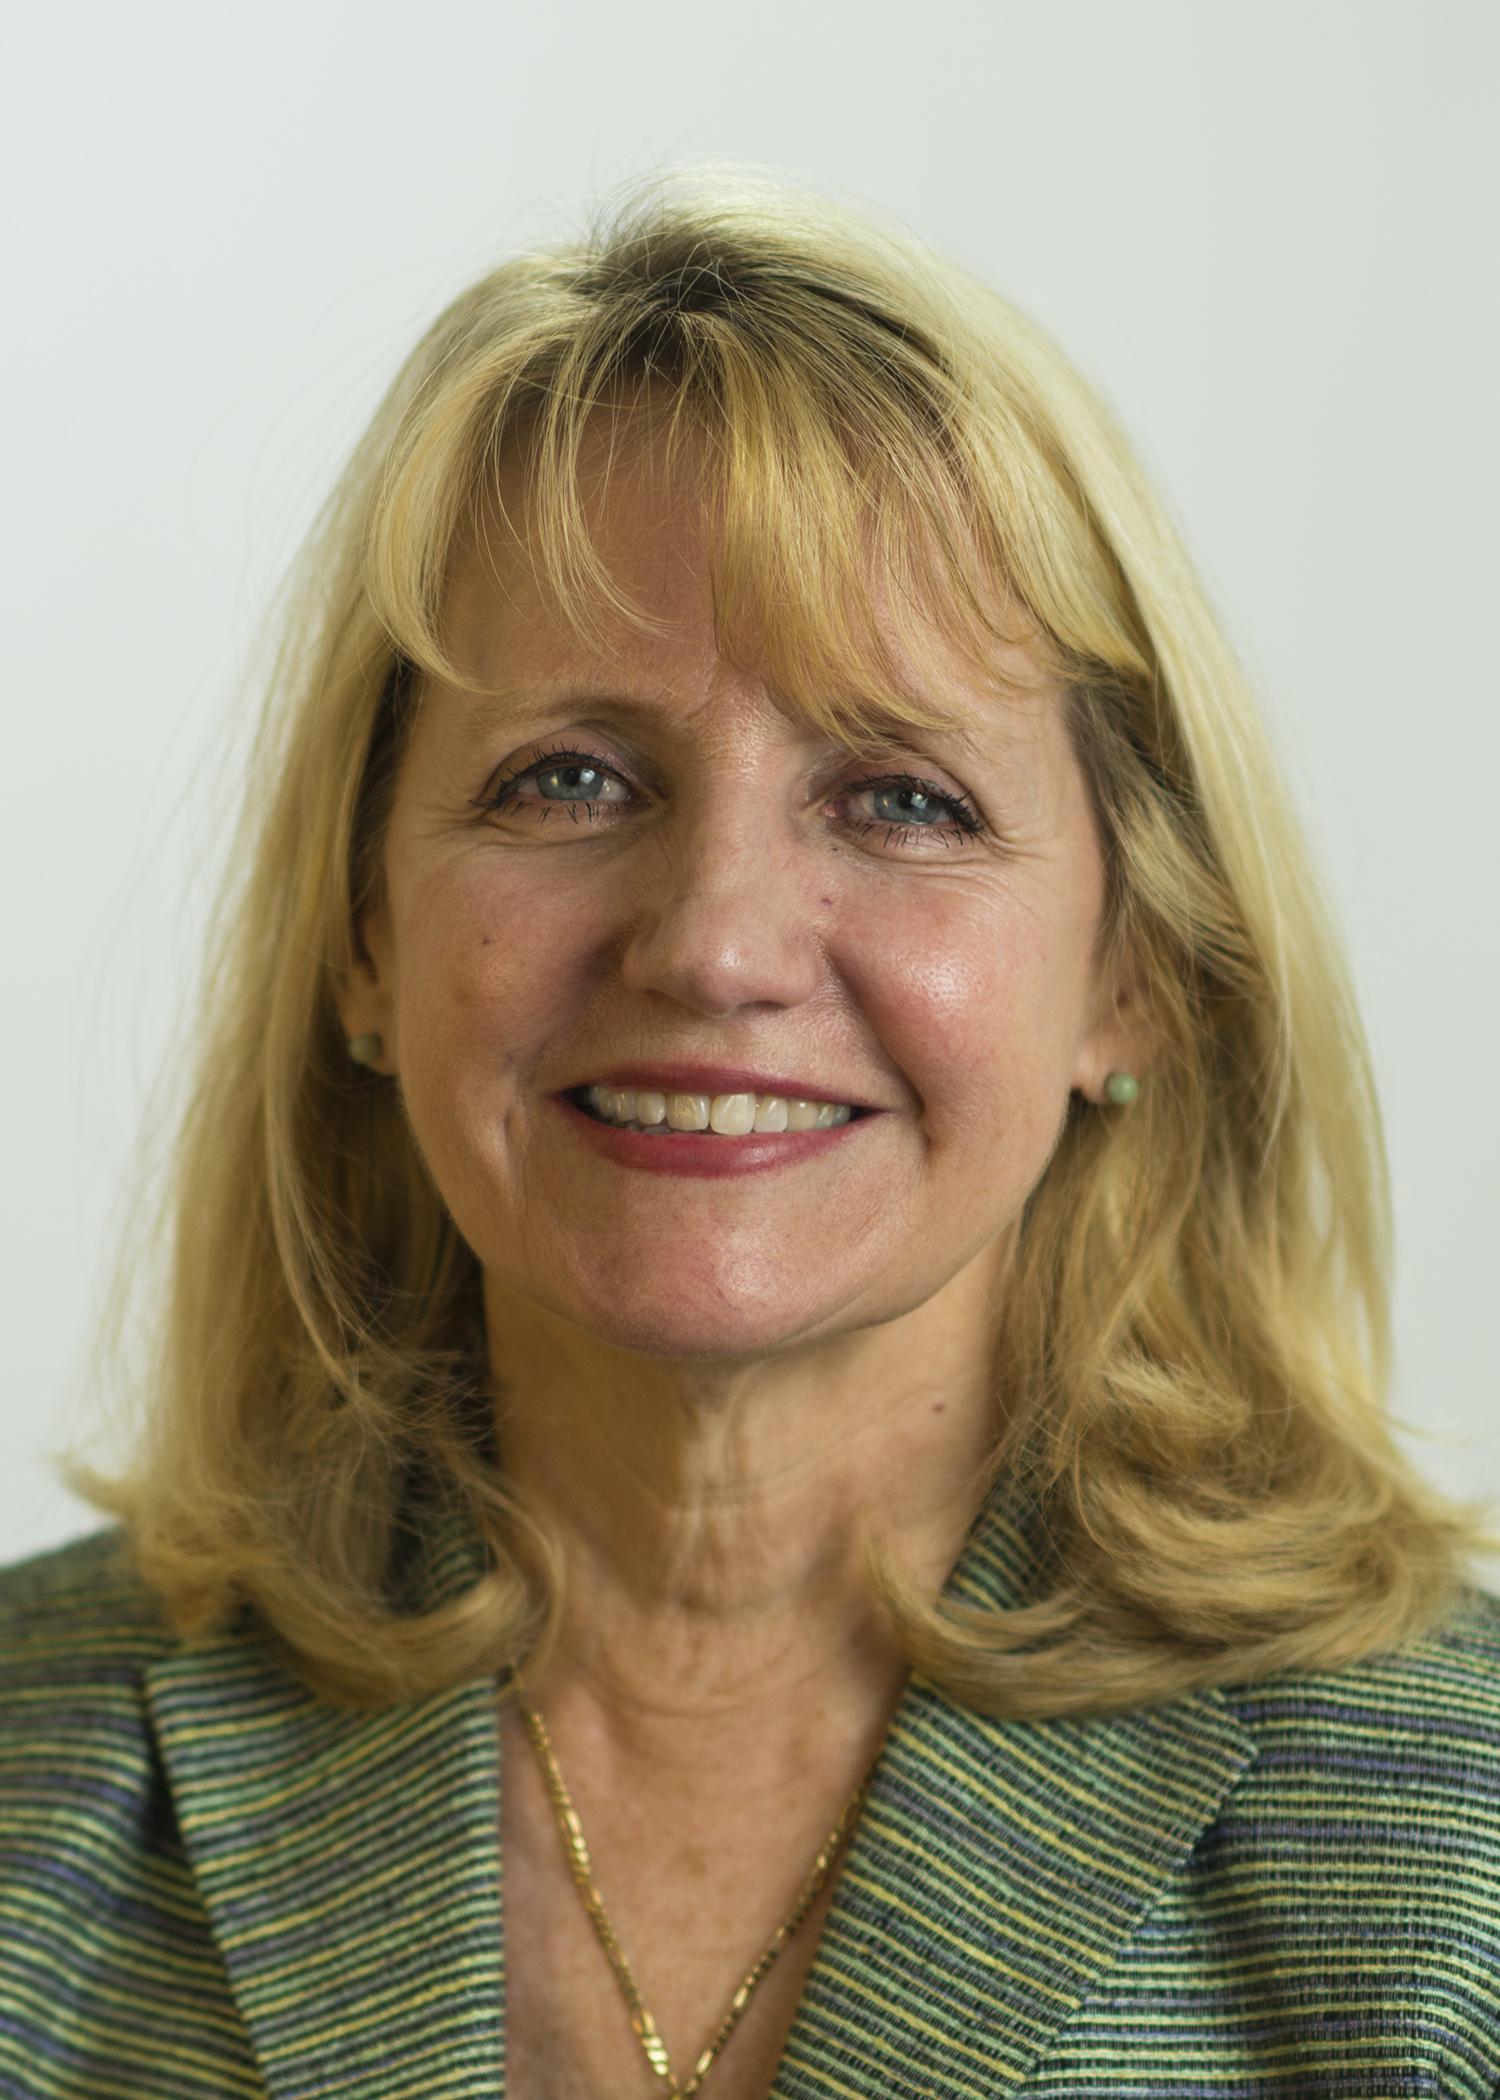 Profile image of Lis Handley